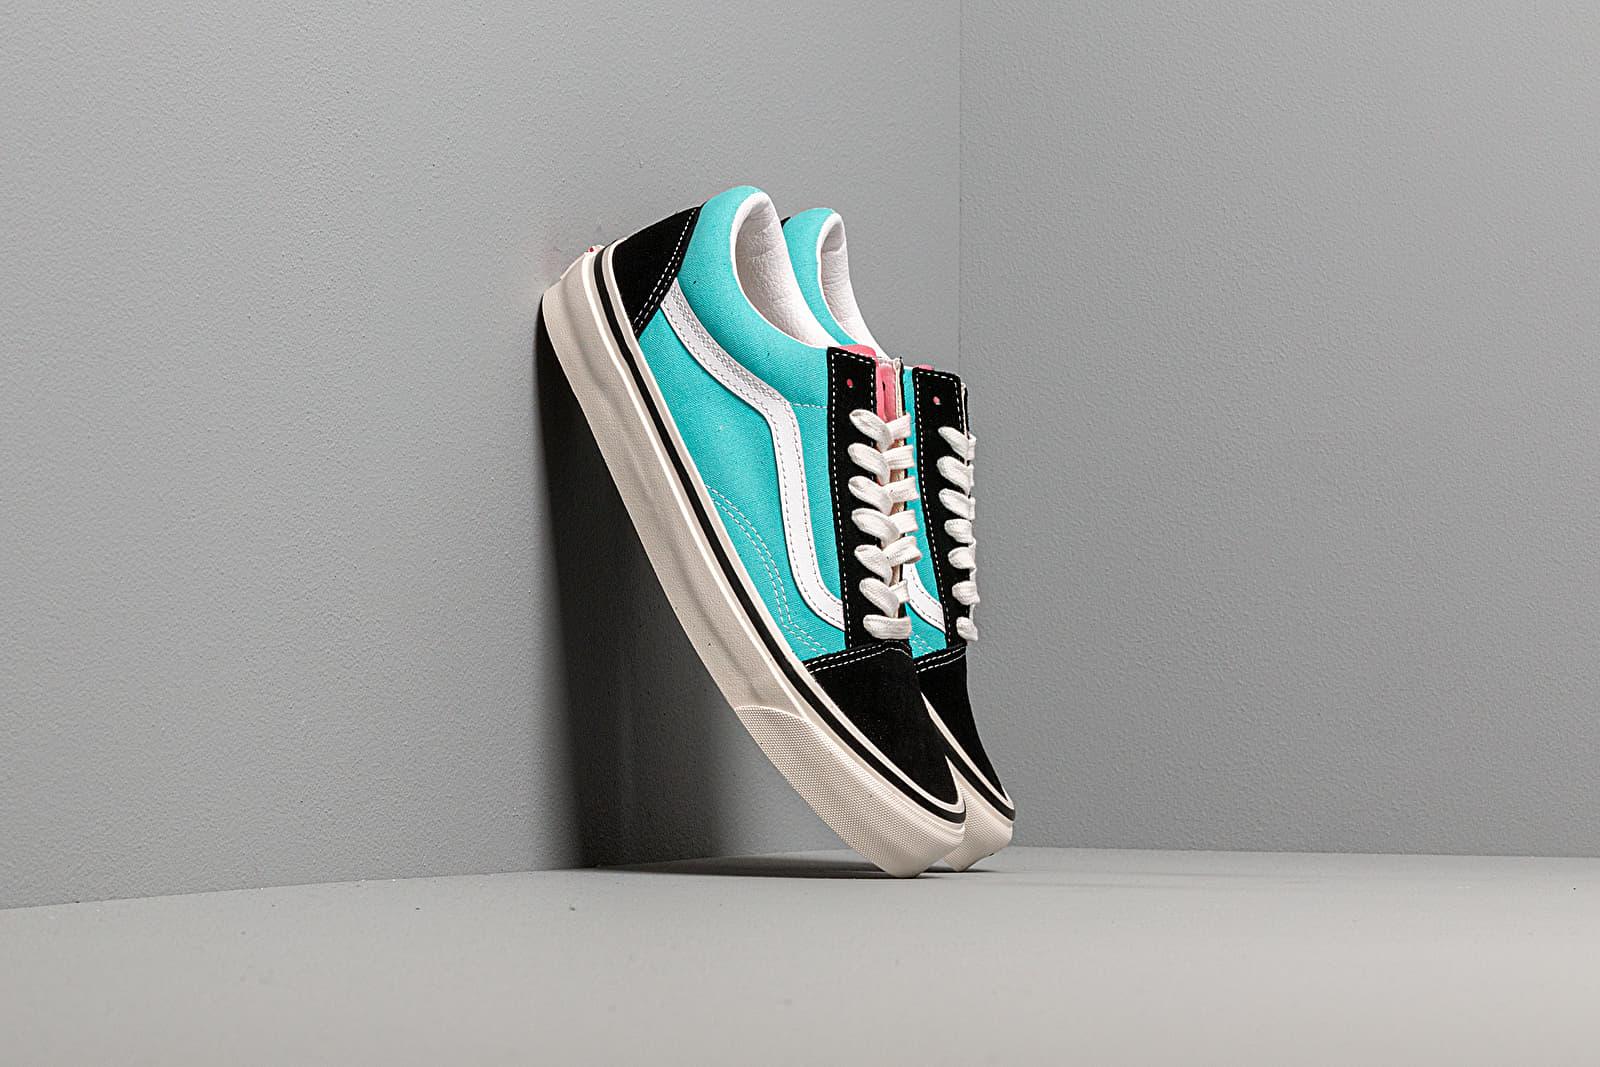 Pánské tenisky a boty Vans Old Skool 36 Dx (Anaheim Factory) Black